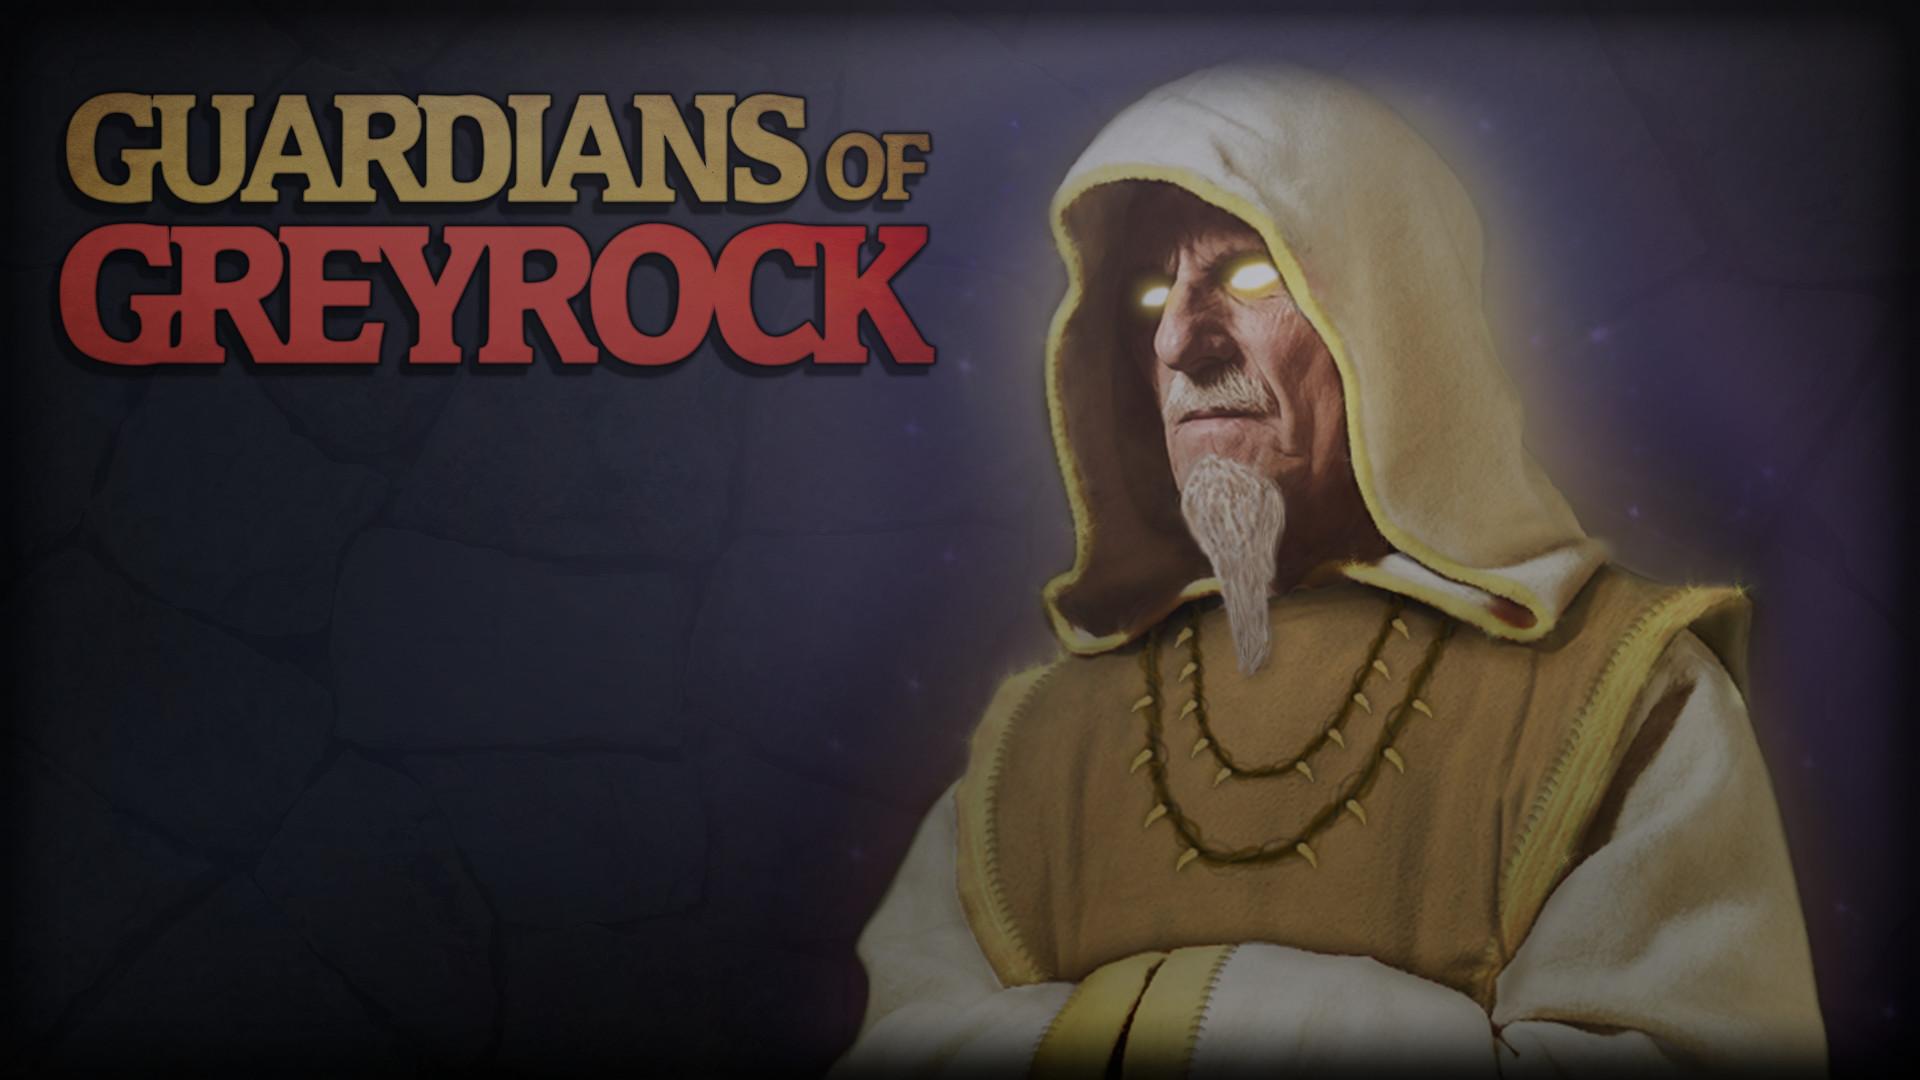 Guardians of Greyrock - Free Wallpaper Pack screenshot